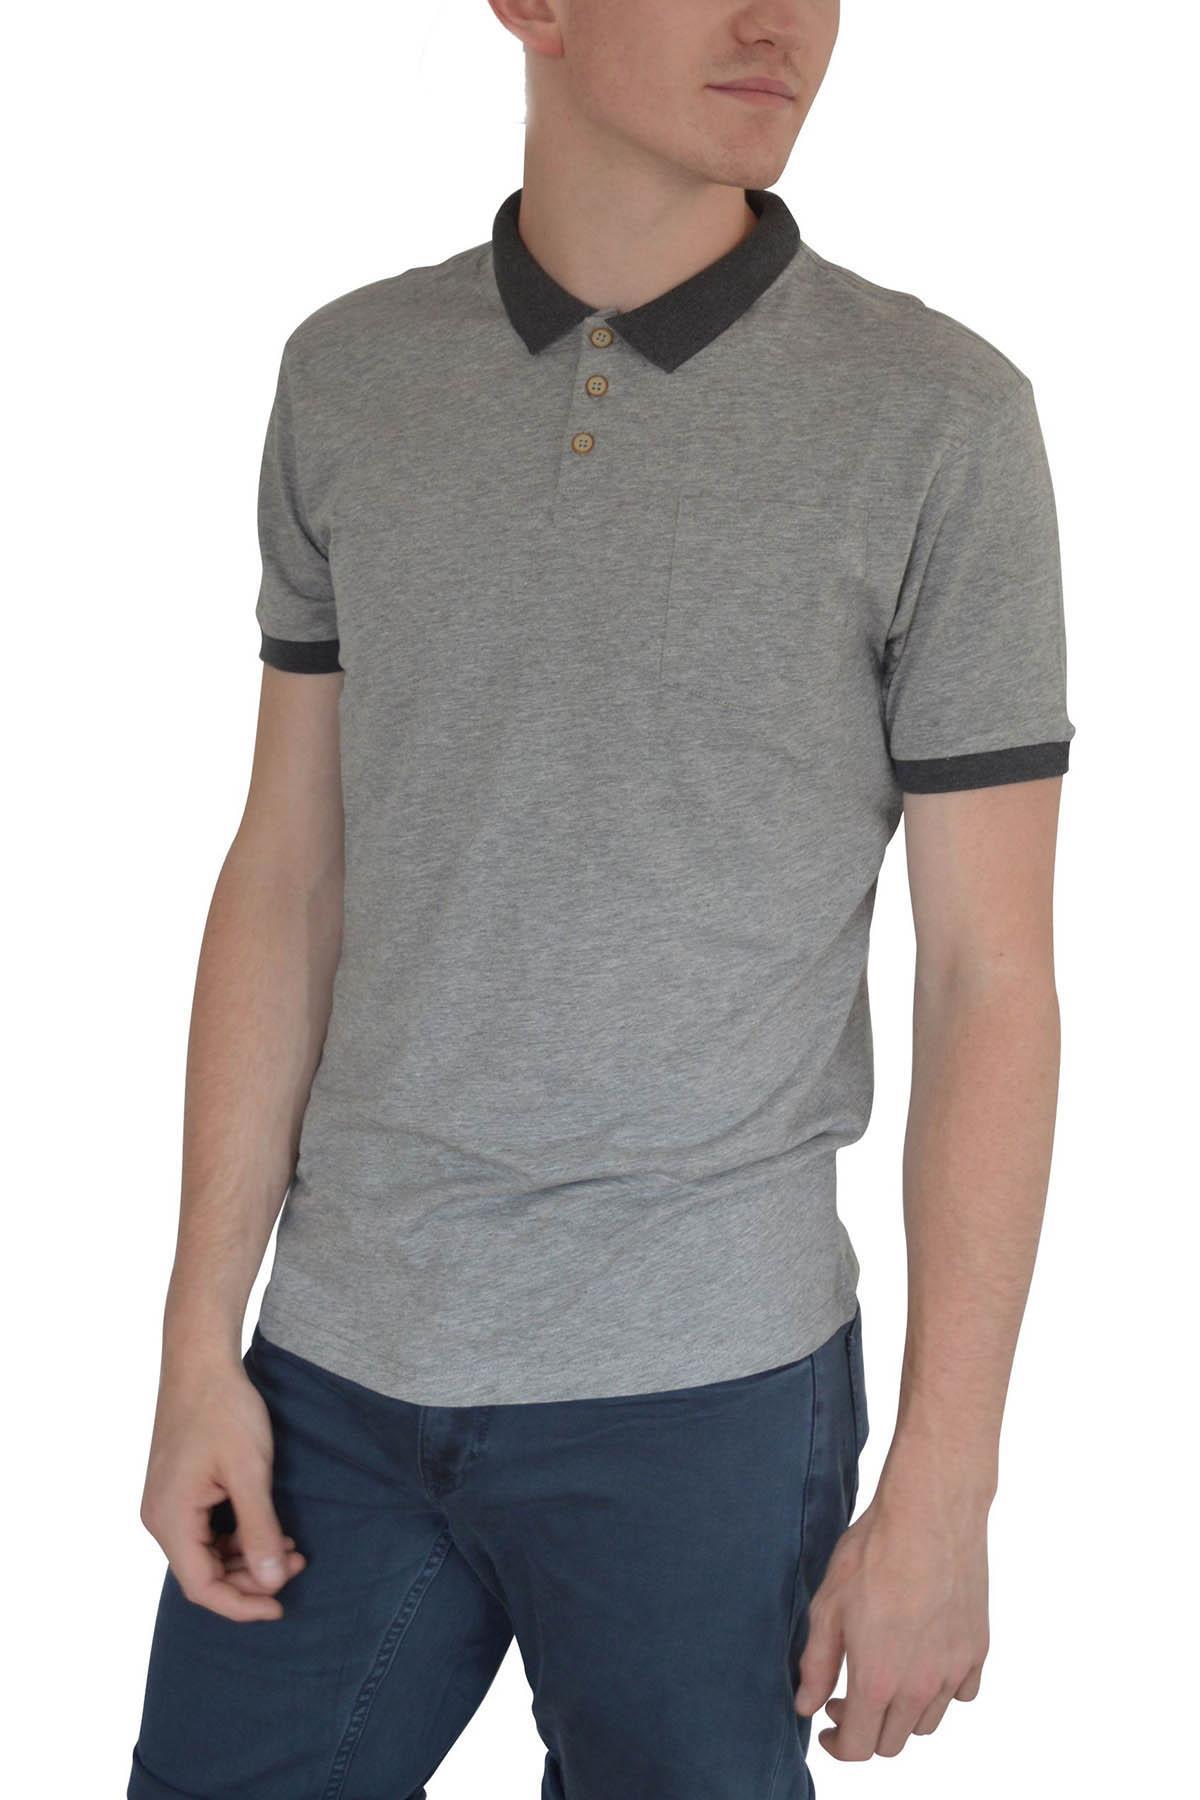 Ex-Mens-H-amp-M-Cotton-Polo-Shirt-Contrast-Collar-Size-S-XXL thumbnail 8